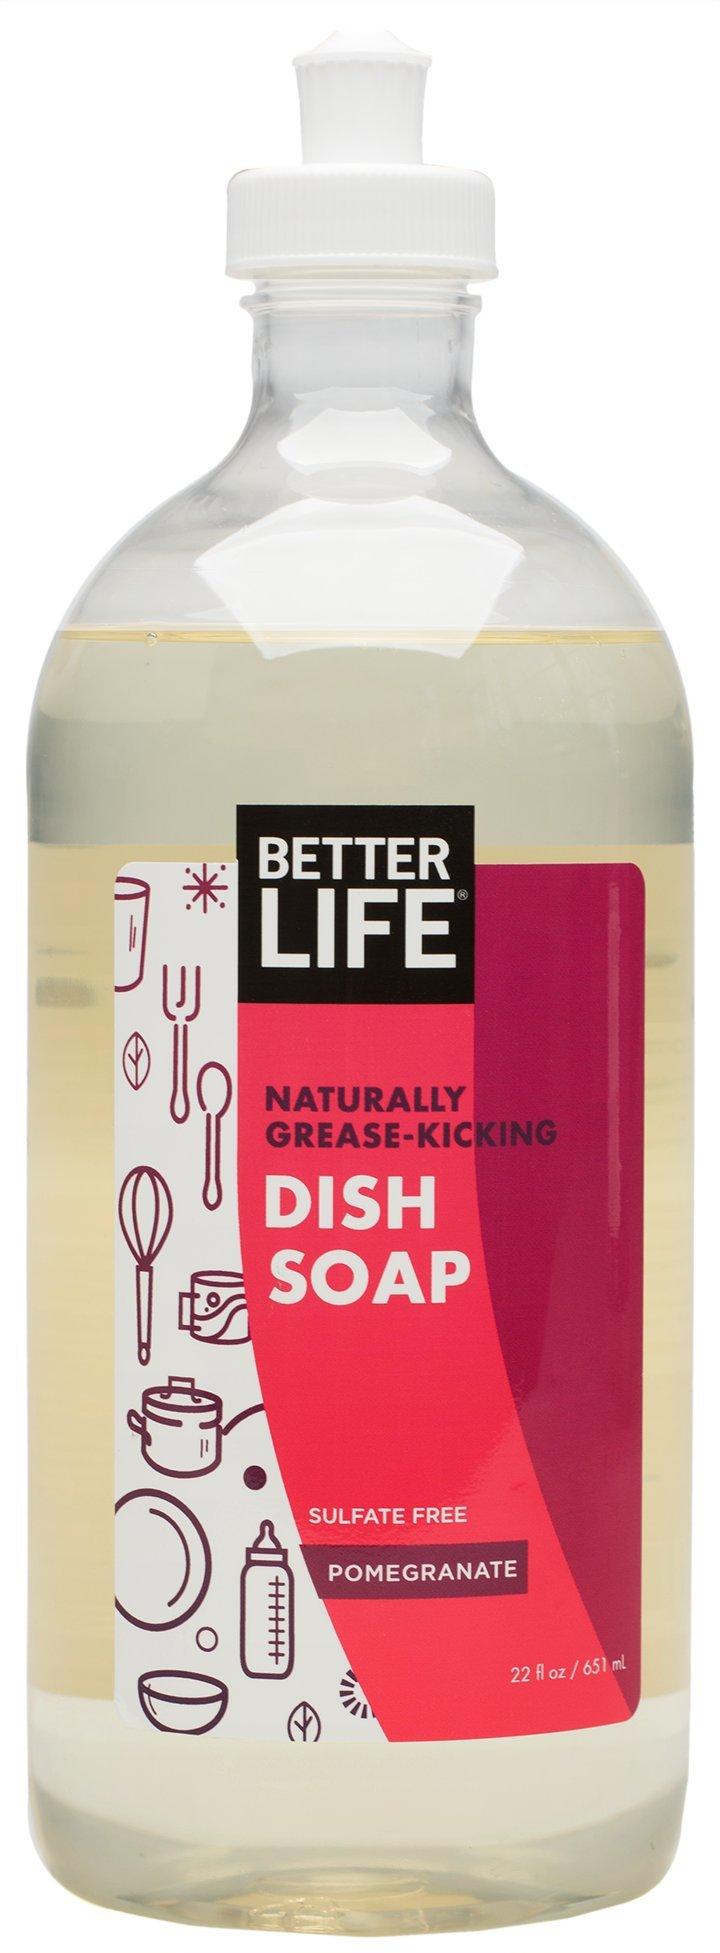 Better Life Dish Soap, Pomegranate, 22 Ounces